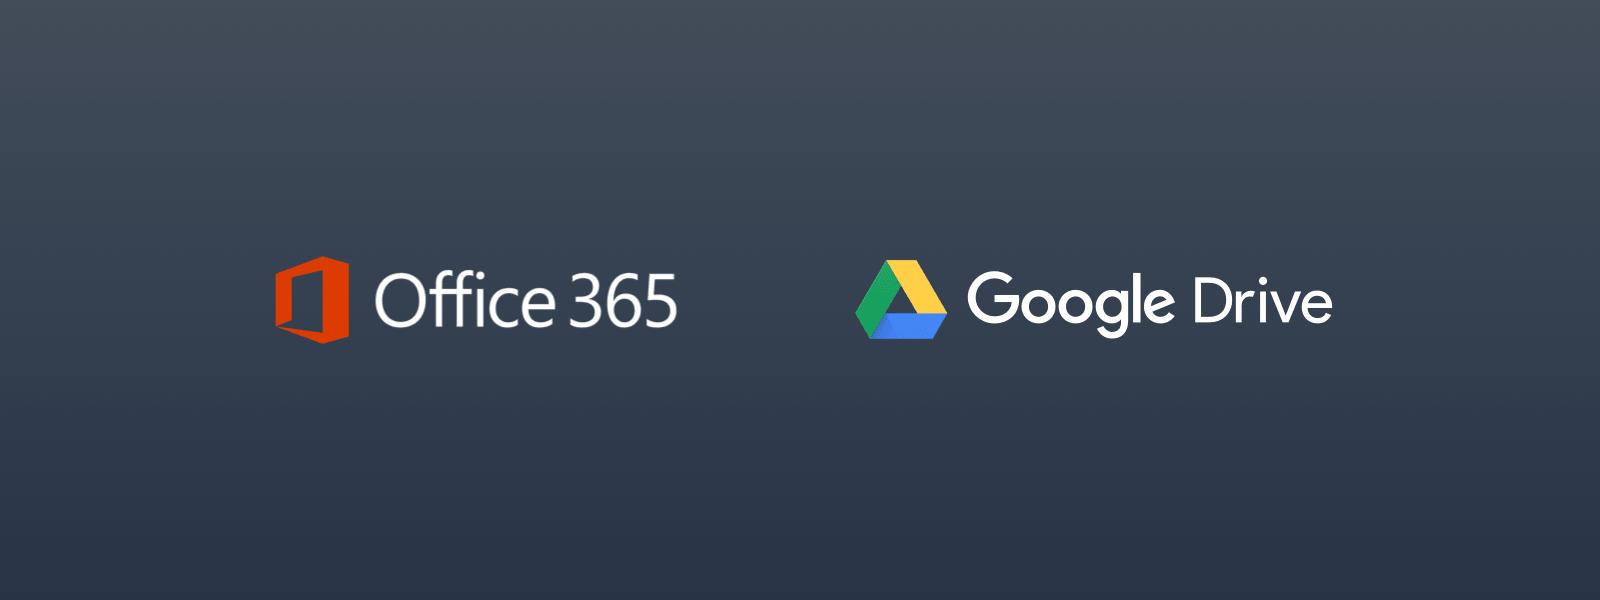 Best Filmmaker Software and Tools - Best Filmmaking Apps - Office 365 - Google Drive